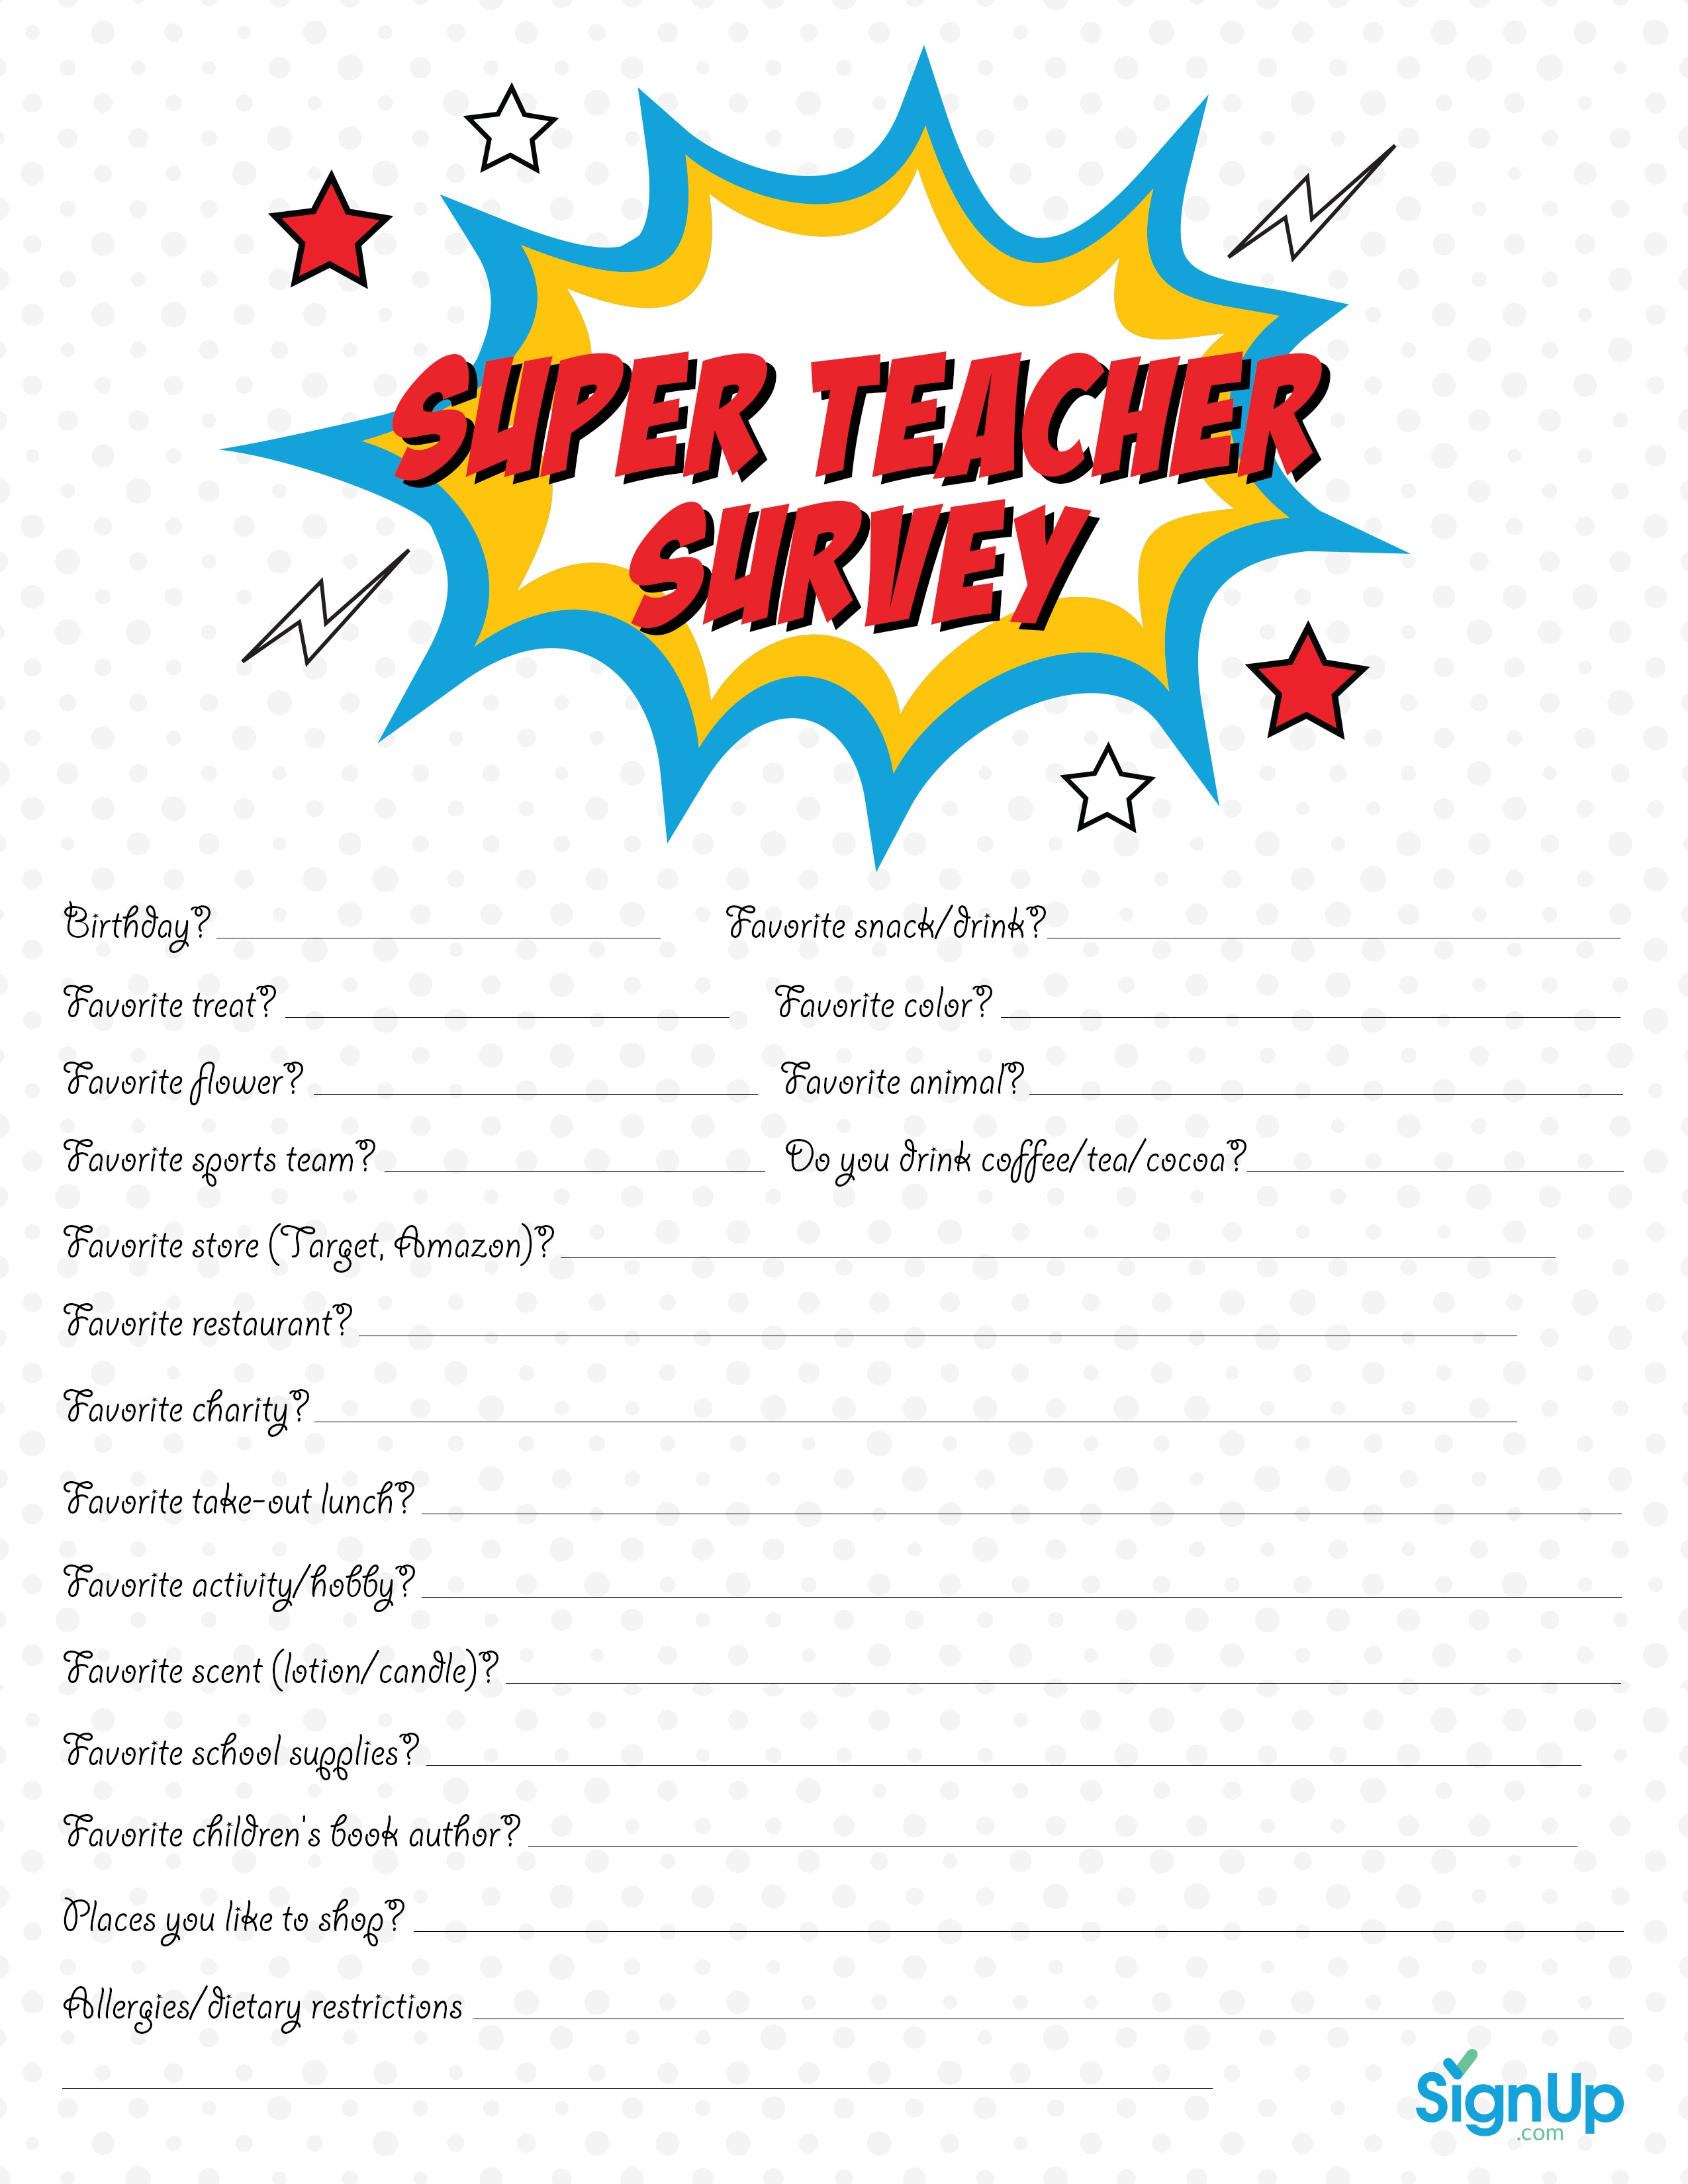 Teacher Survey: Free Downloadable Room Parent Resource | Signup - Make A Printable Survey Free